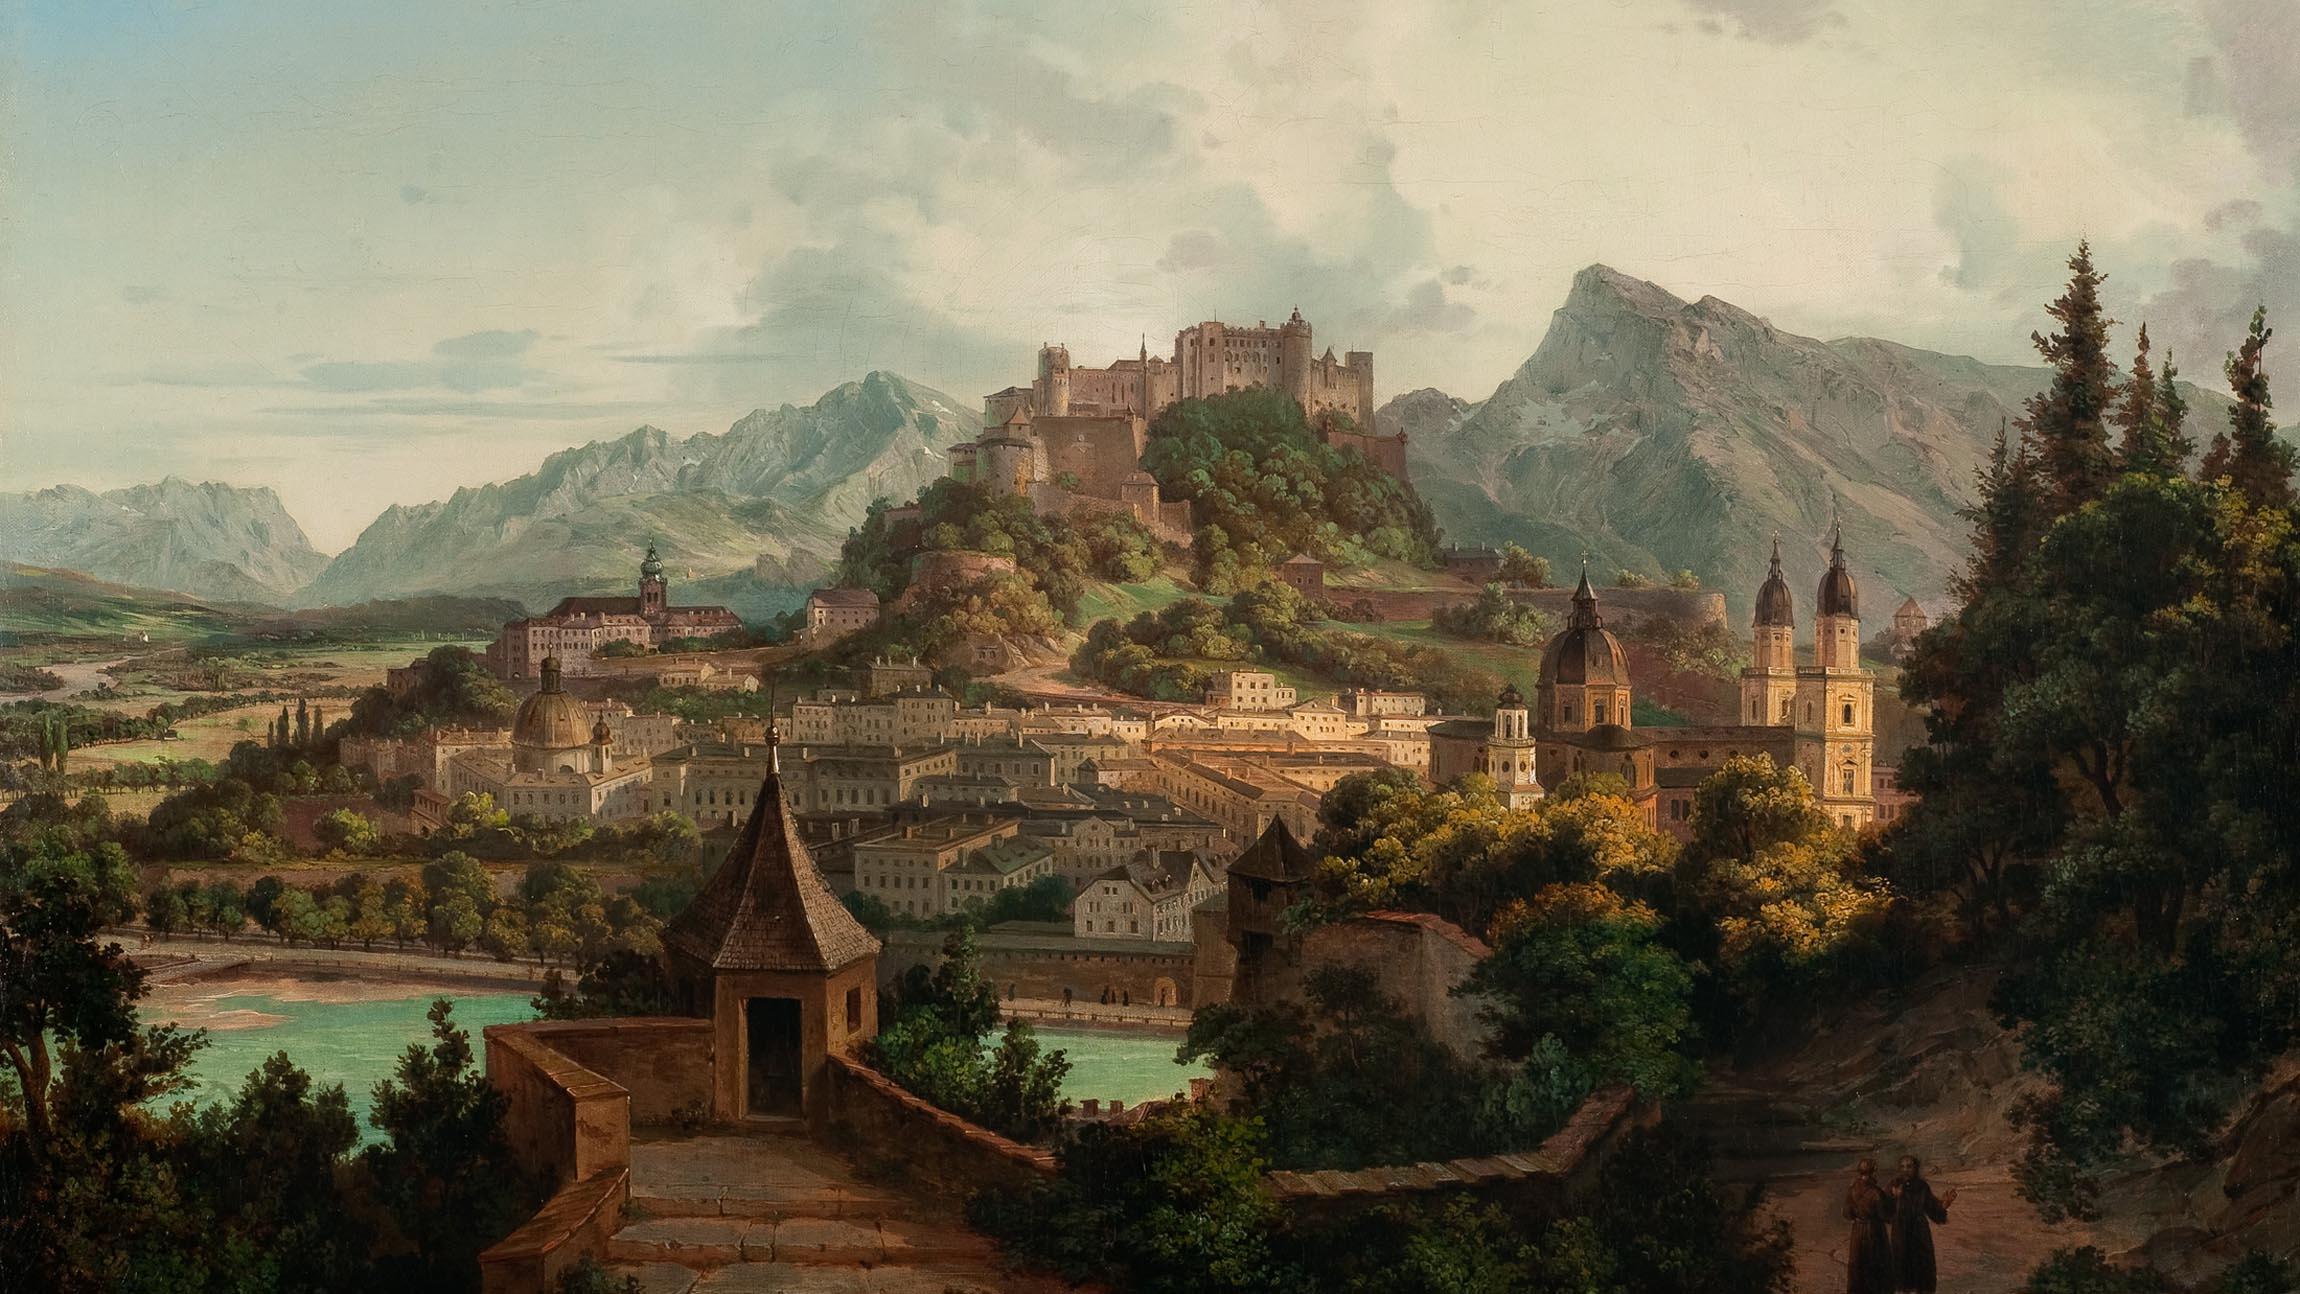 Hubert-Auer-Fotograf-Salzburg-Kunstreproduktion-050